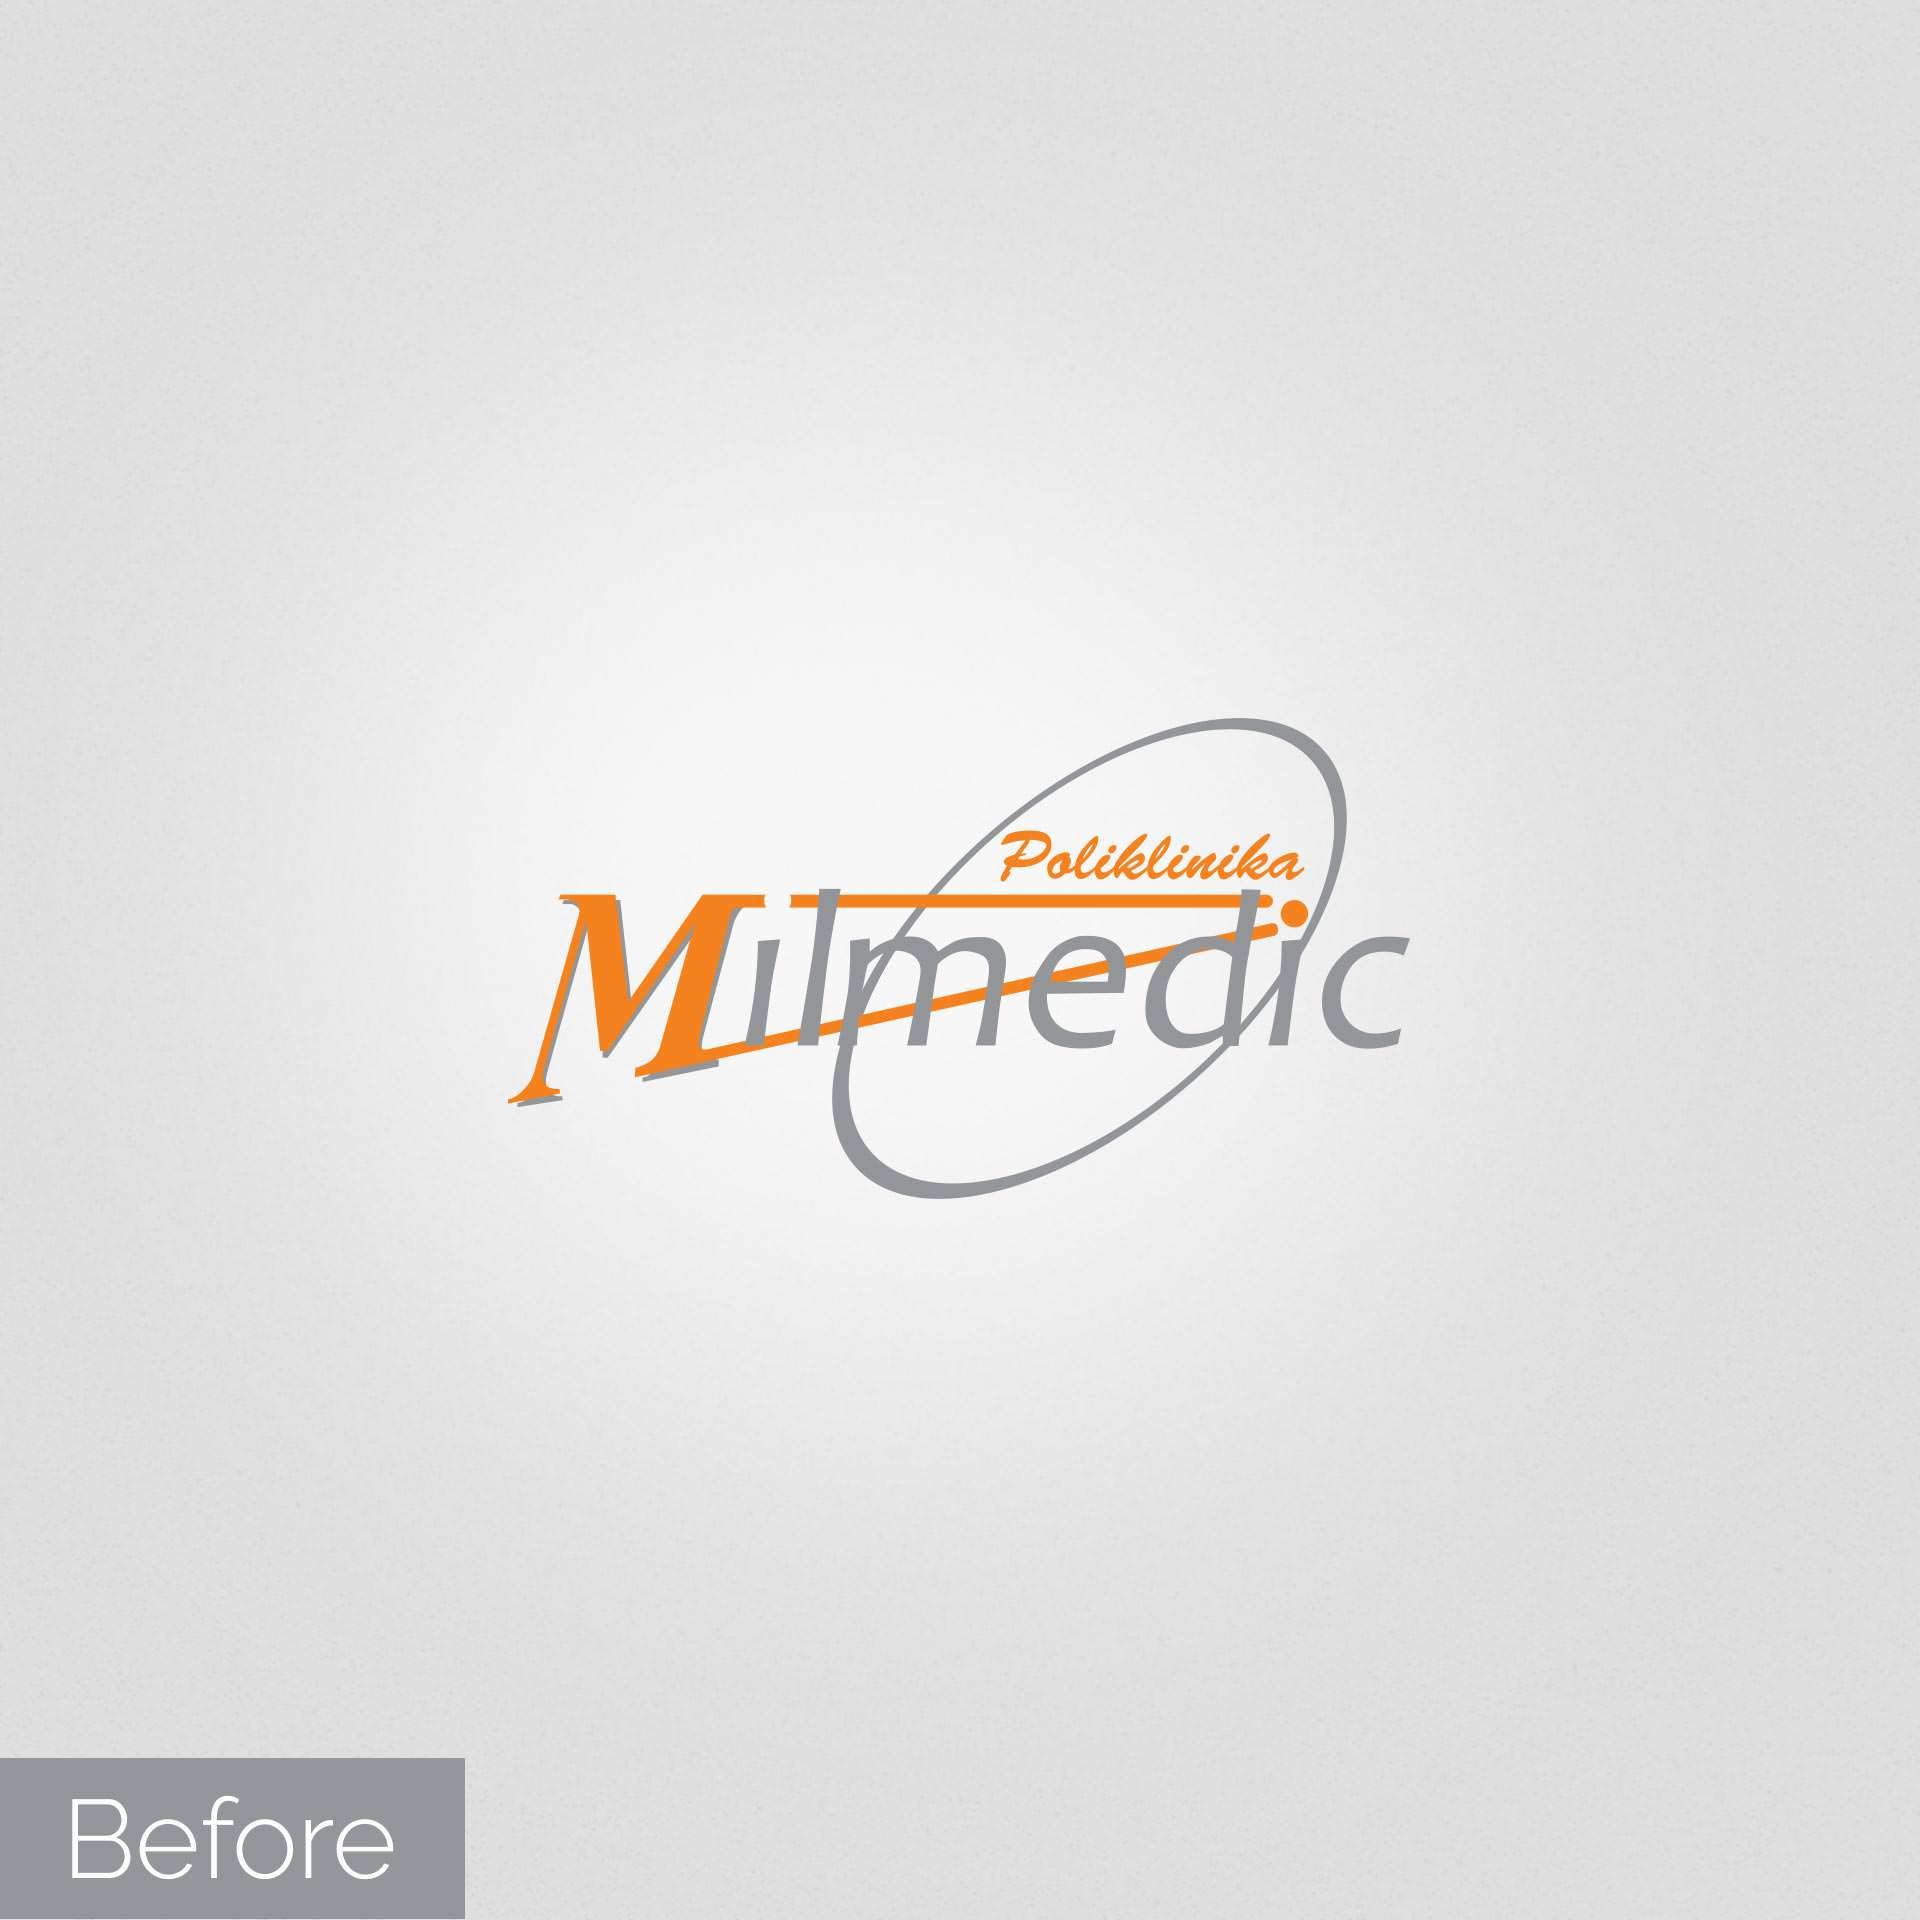 Redizajn logotipa za Milmedic kliniku - Staro rešenje